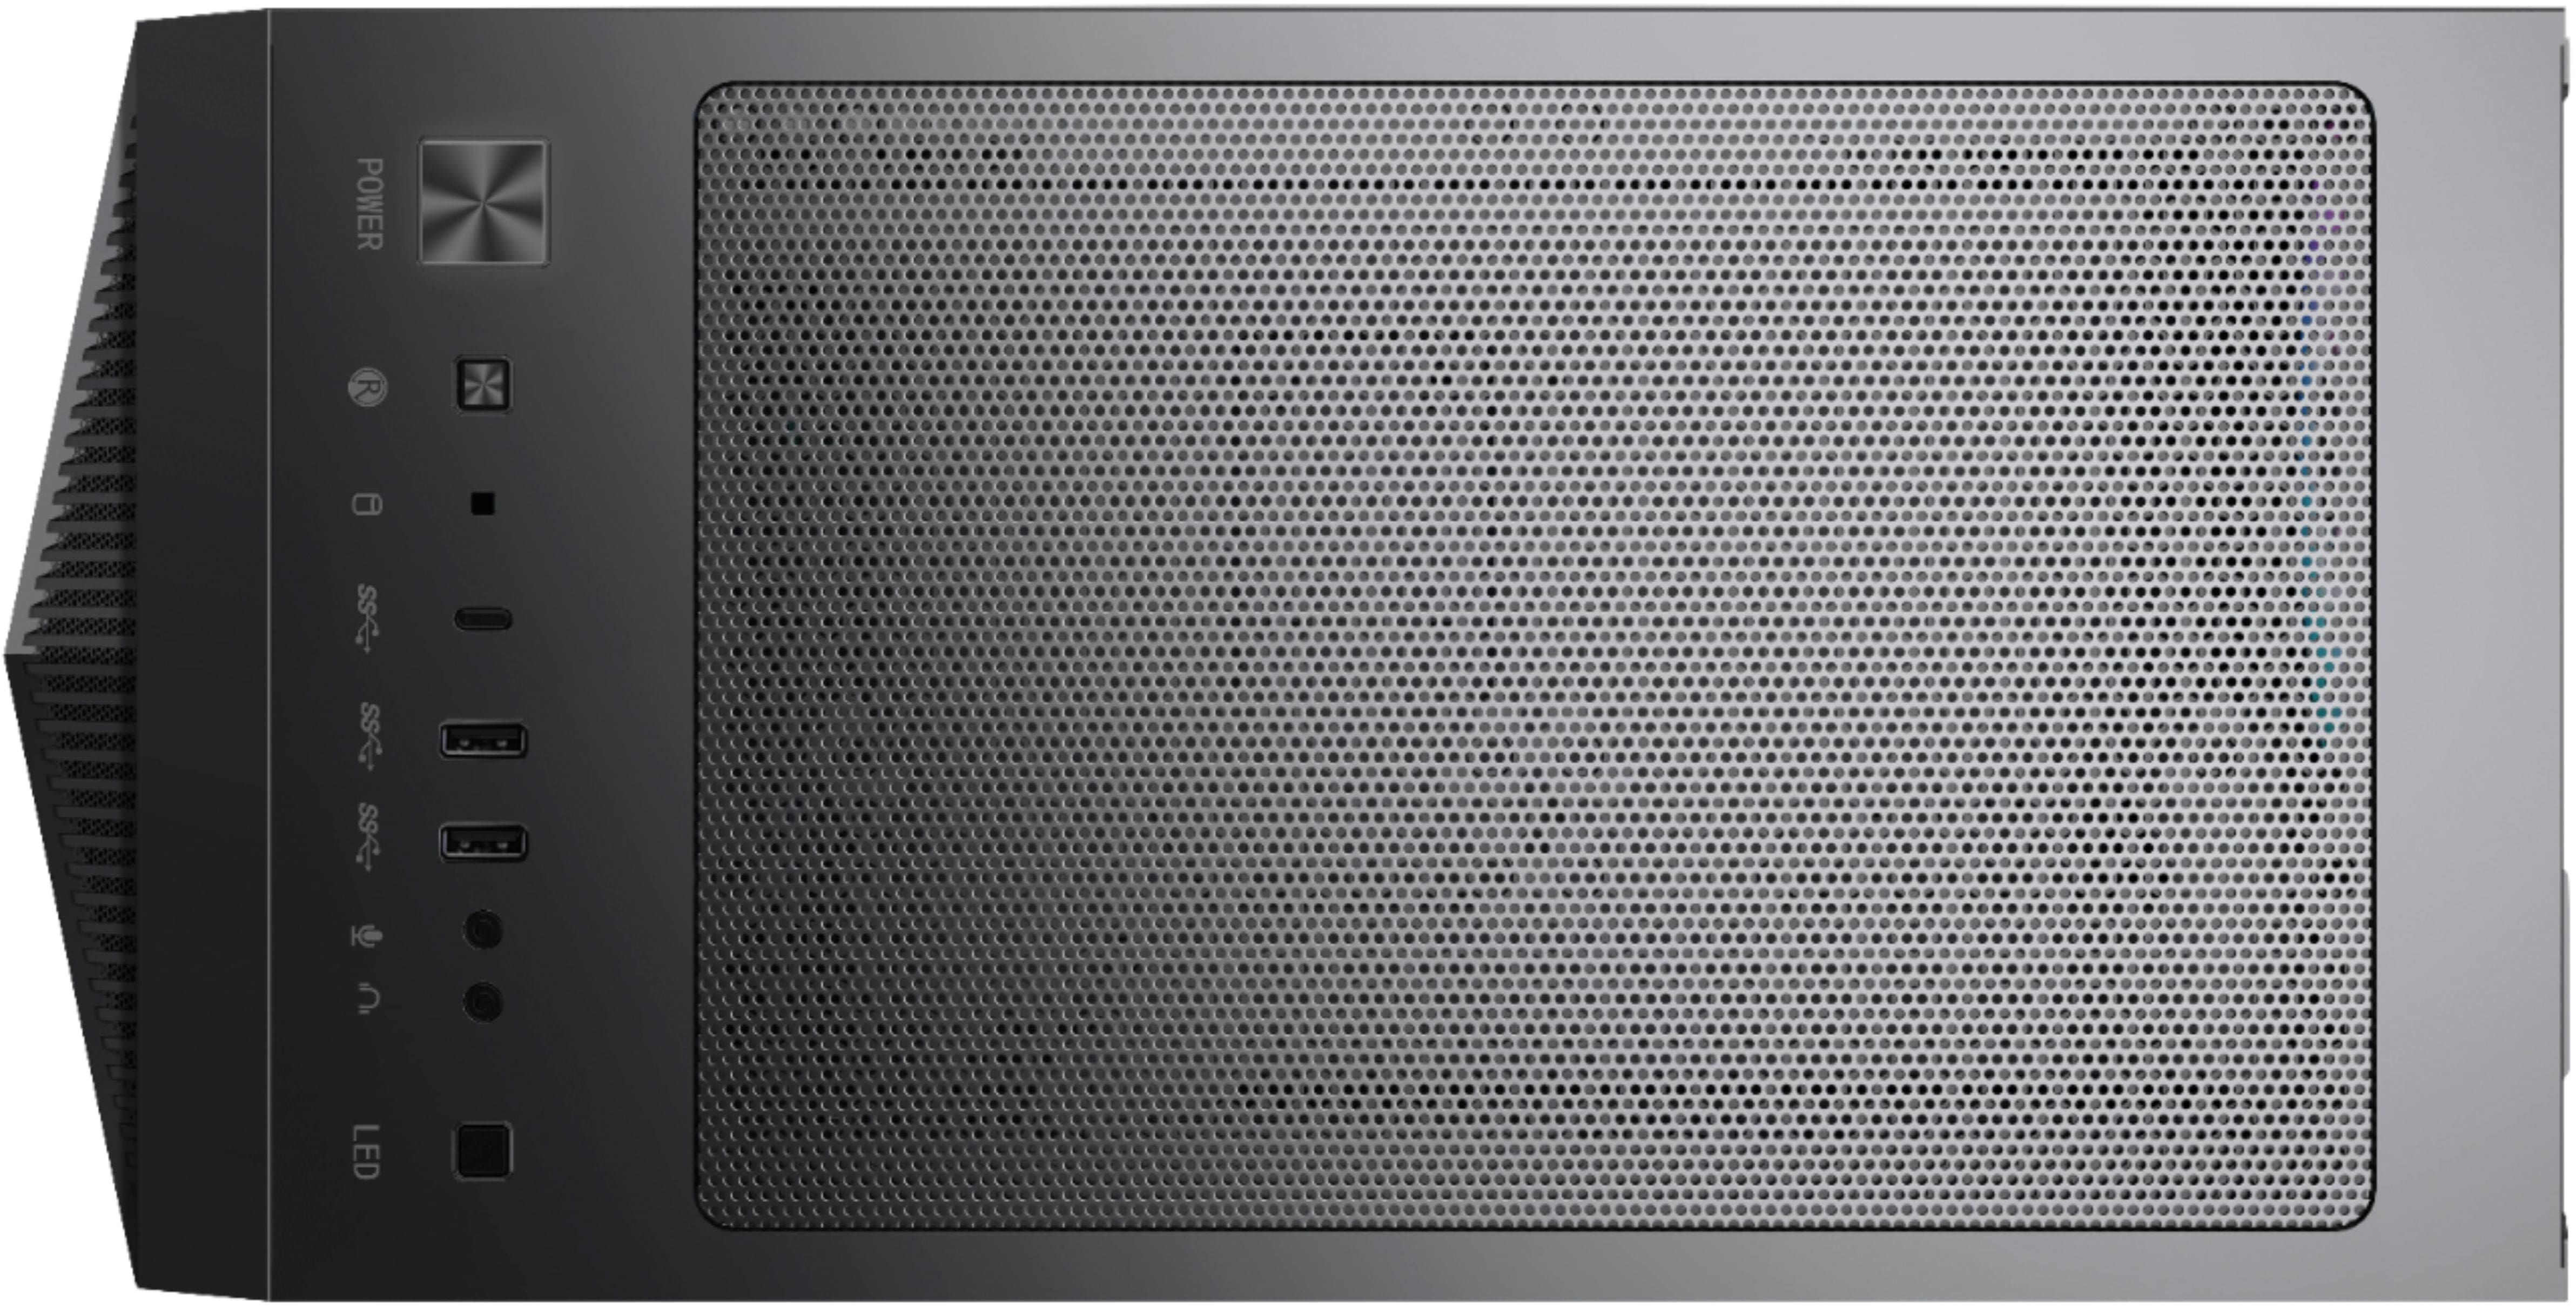 MSI - Aegis RS Gaming Desktop-i7-10700KF - 16GB Memory - NVIDIA GeForce RTX 3080 - 1TB SSD $2249.99 at BestBuy